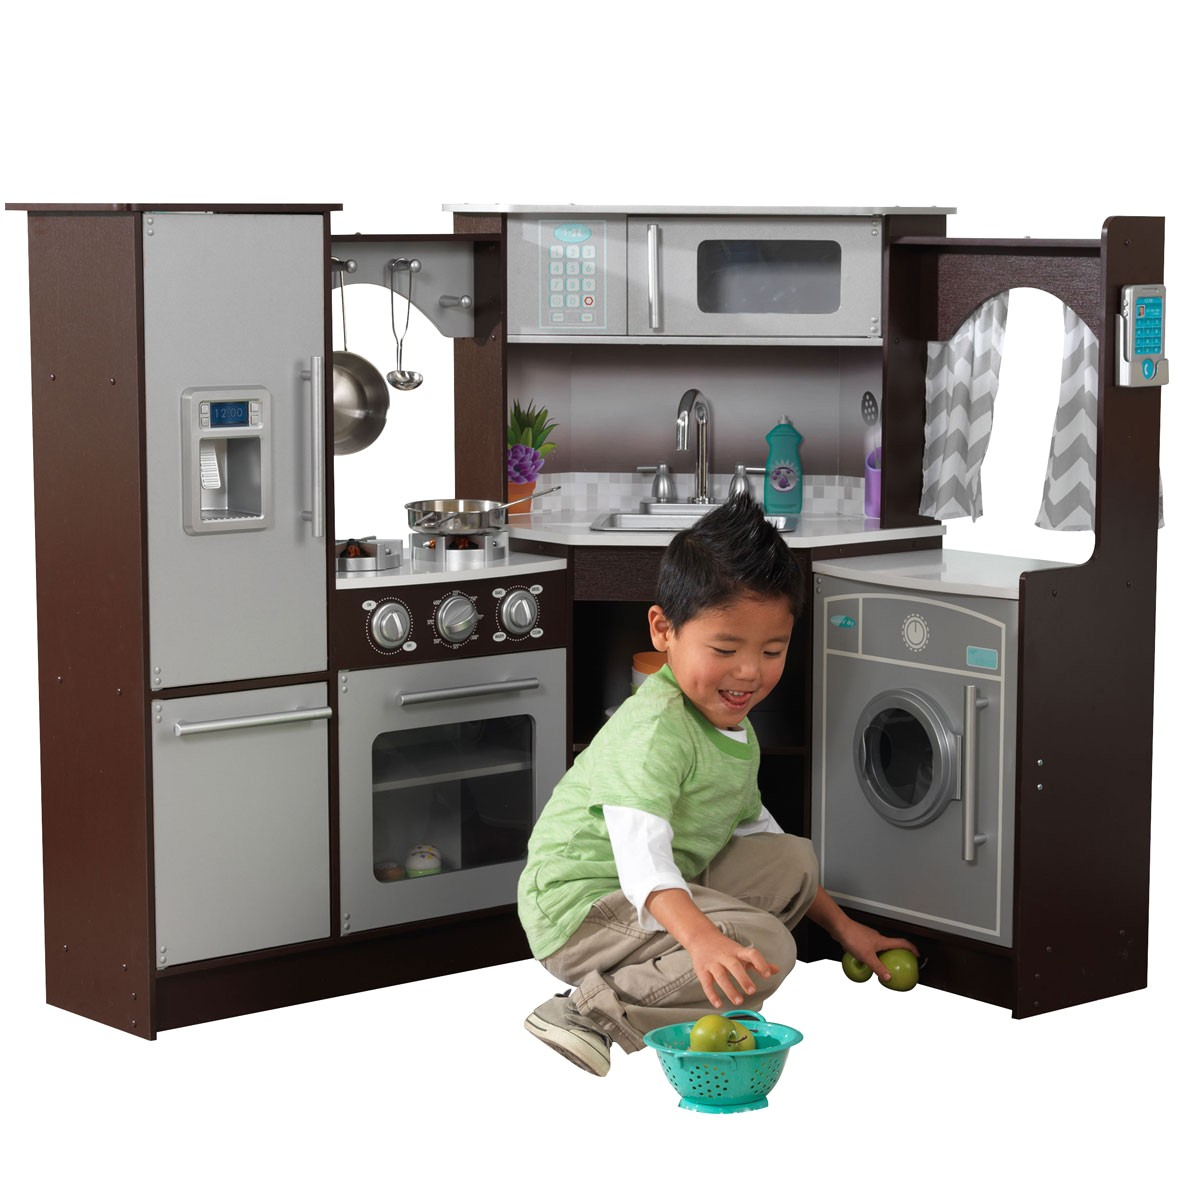 kidkraft ulitmate corner play kitchen w lights sounds